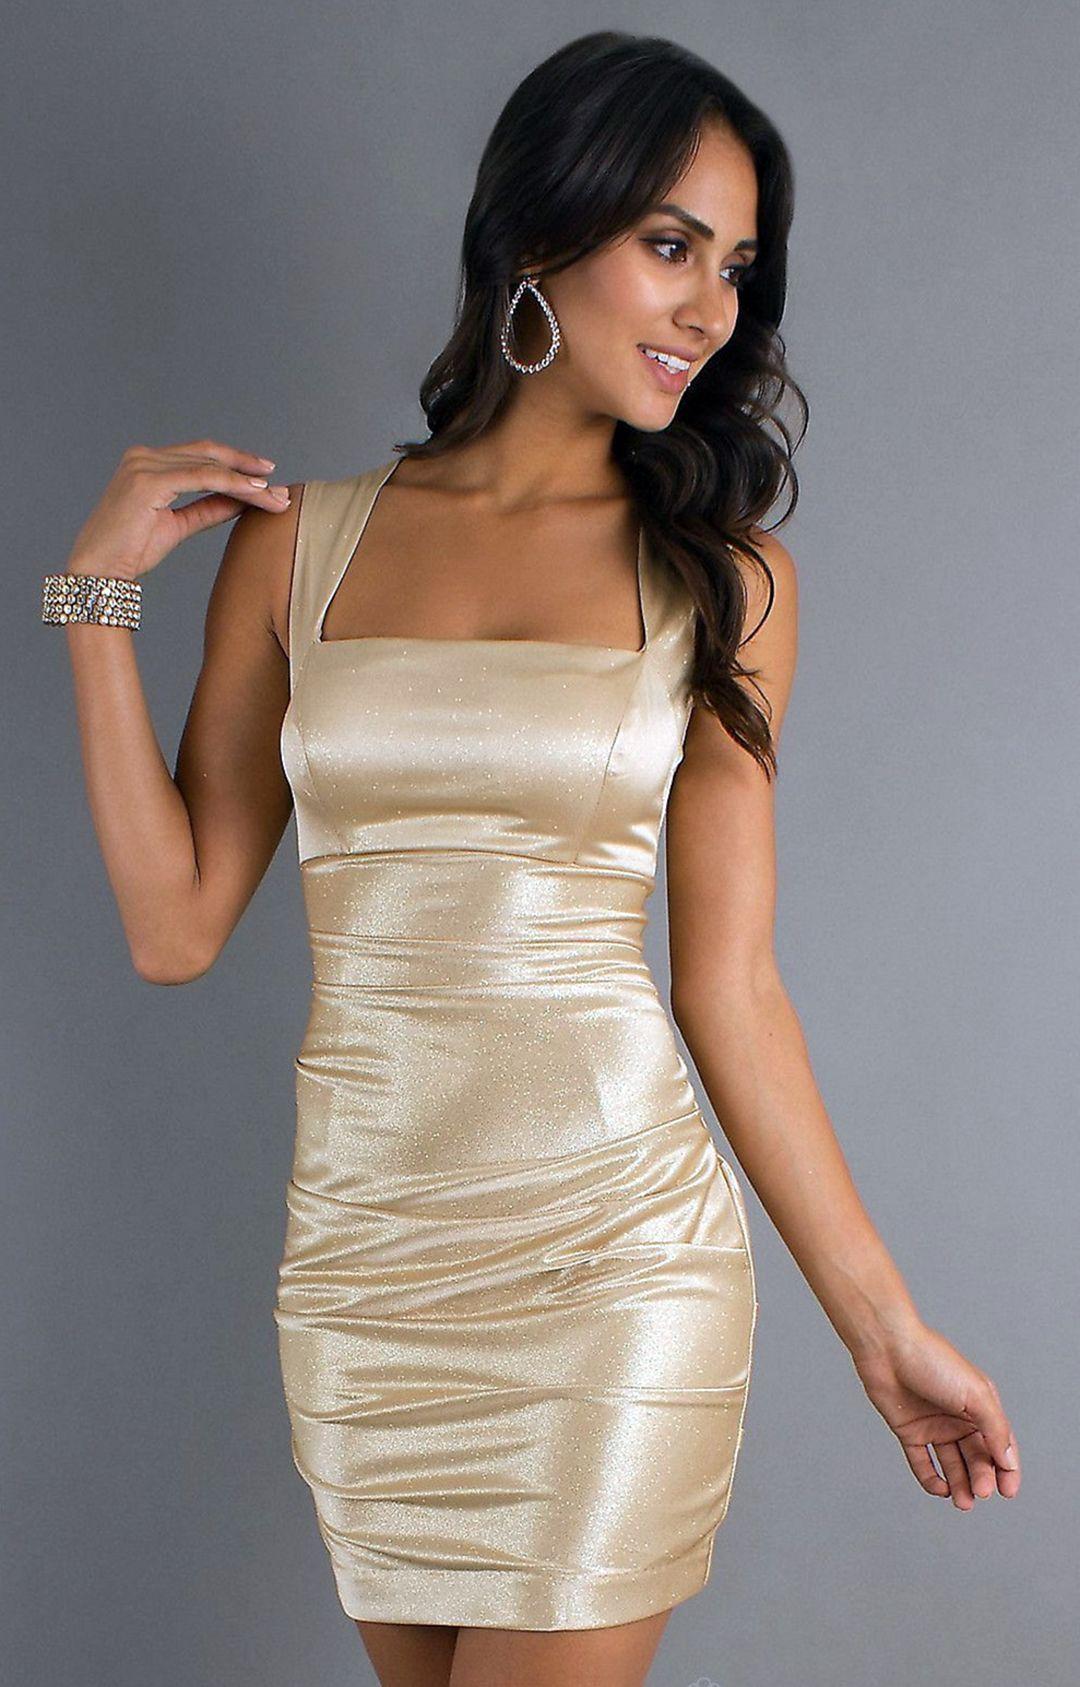 10 Best Party Dress Models Trends 2020 Fashions Nowadays Cocktail Dress Maternity Short Semi Formal Dresses Prom Dresses Short